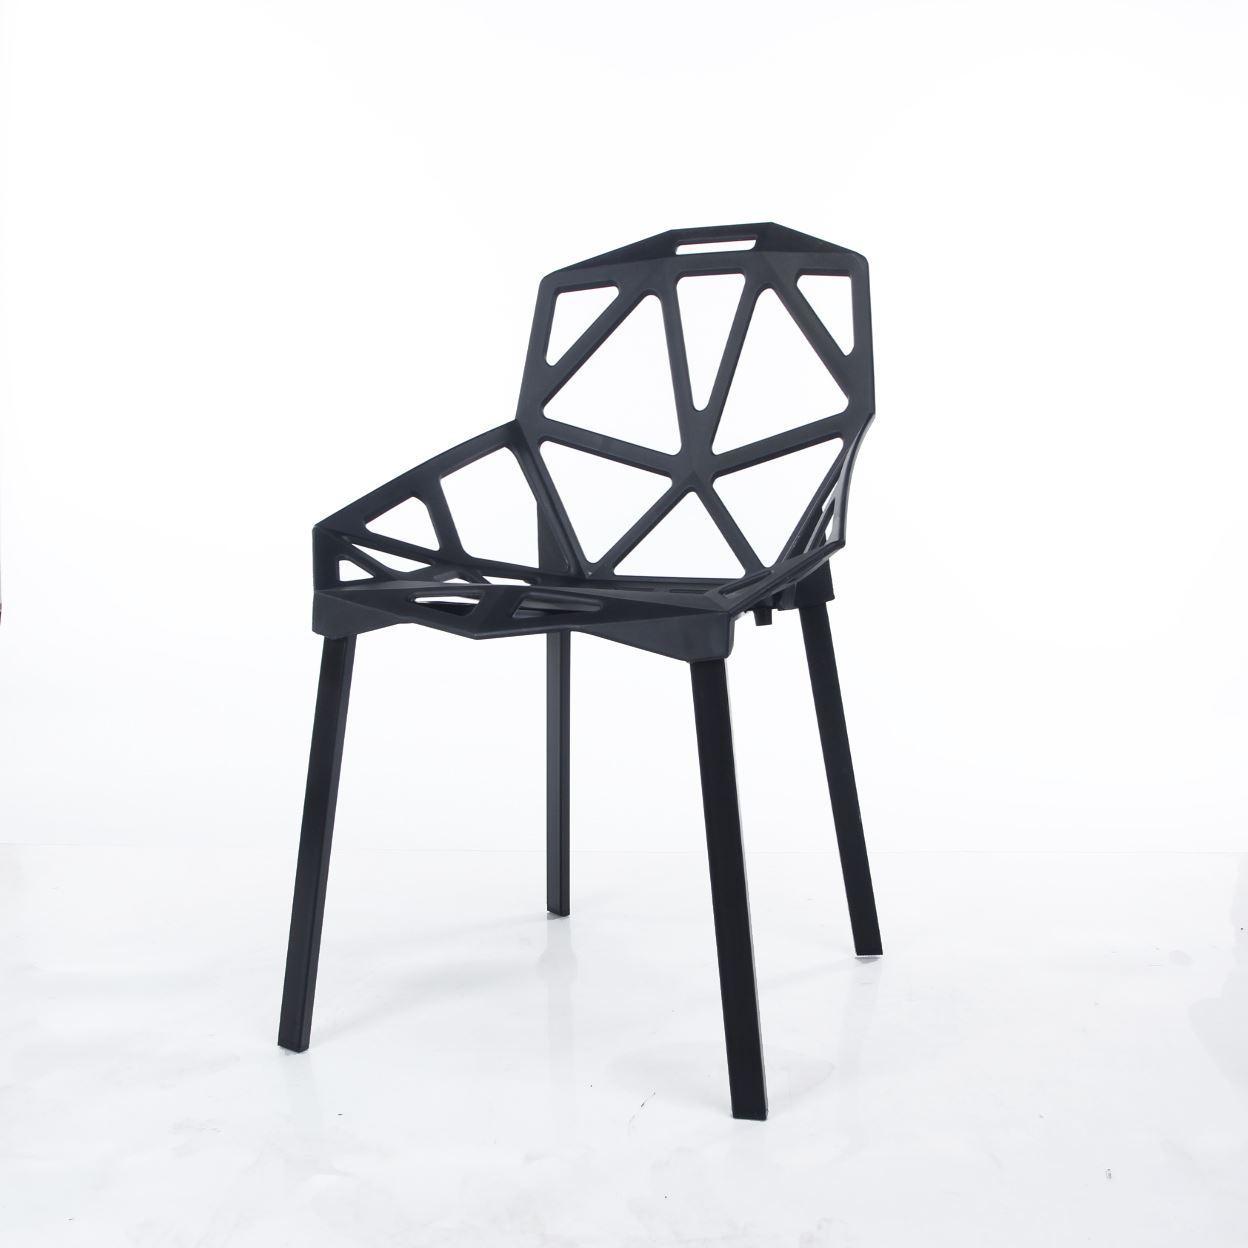 Home Furniture Aluminium Konstantin Grcic One Magis Chair 1